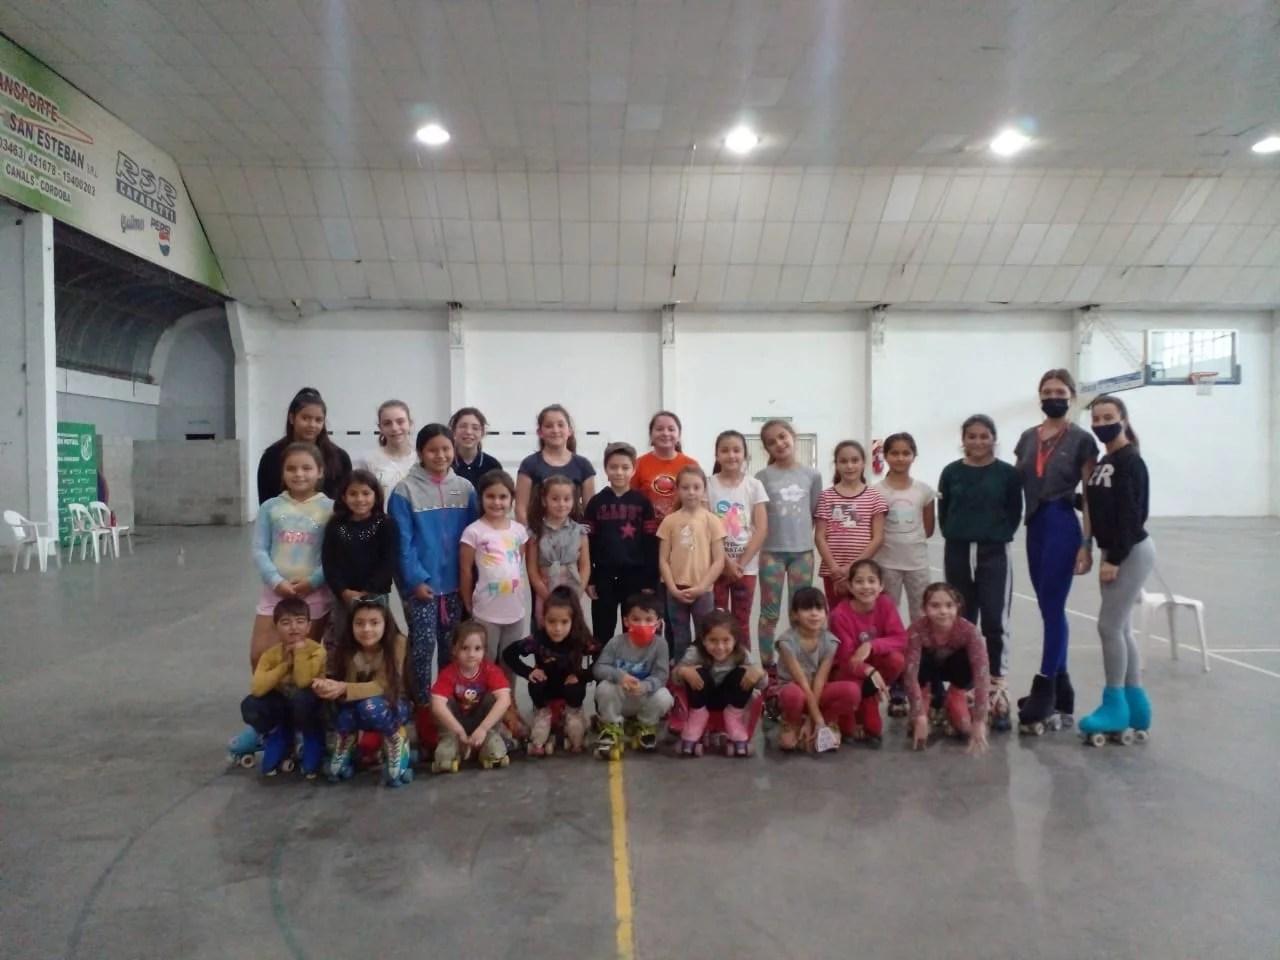 Patín Club Libertad: cada vez son más niños los que se suman a esta disciplina.